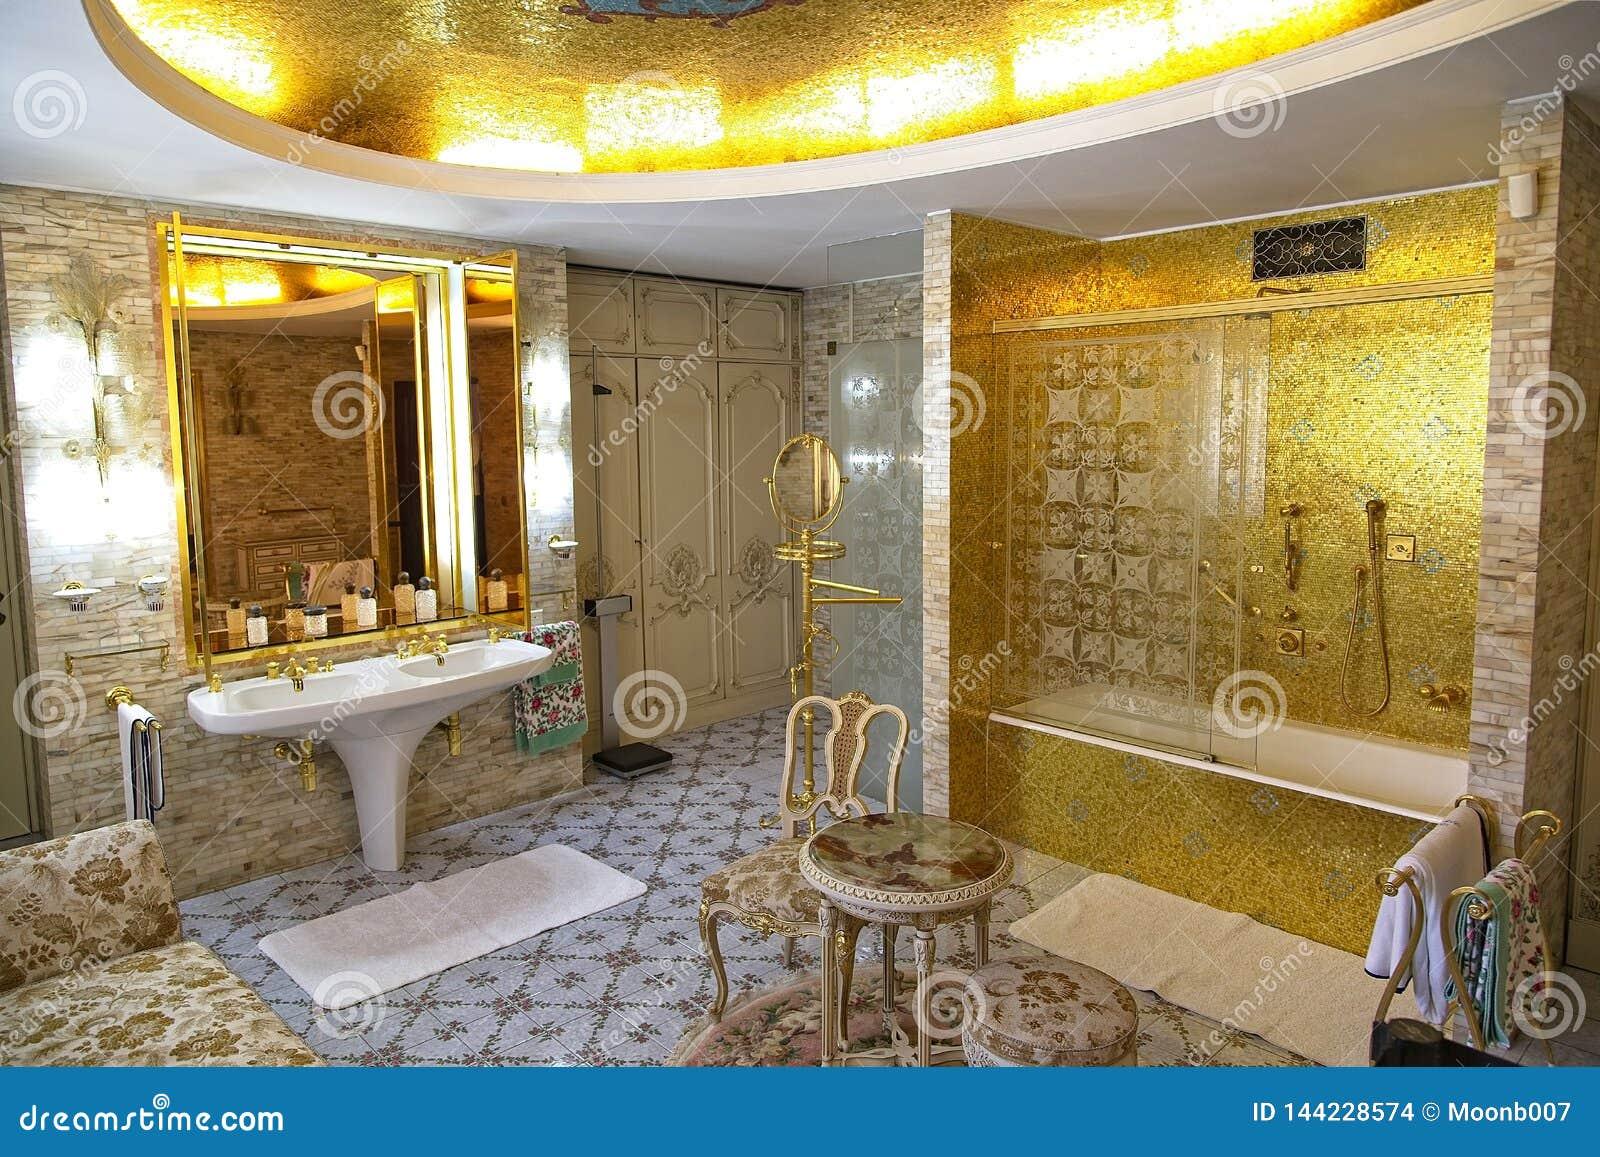 Ceausescu Palace Bathroom